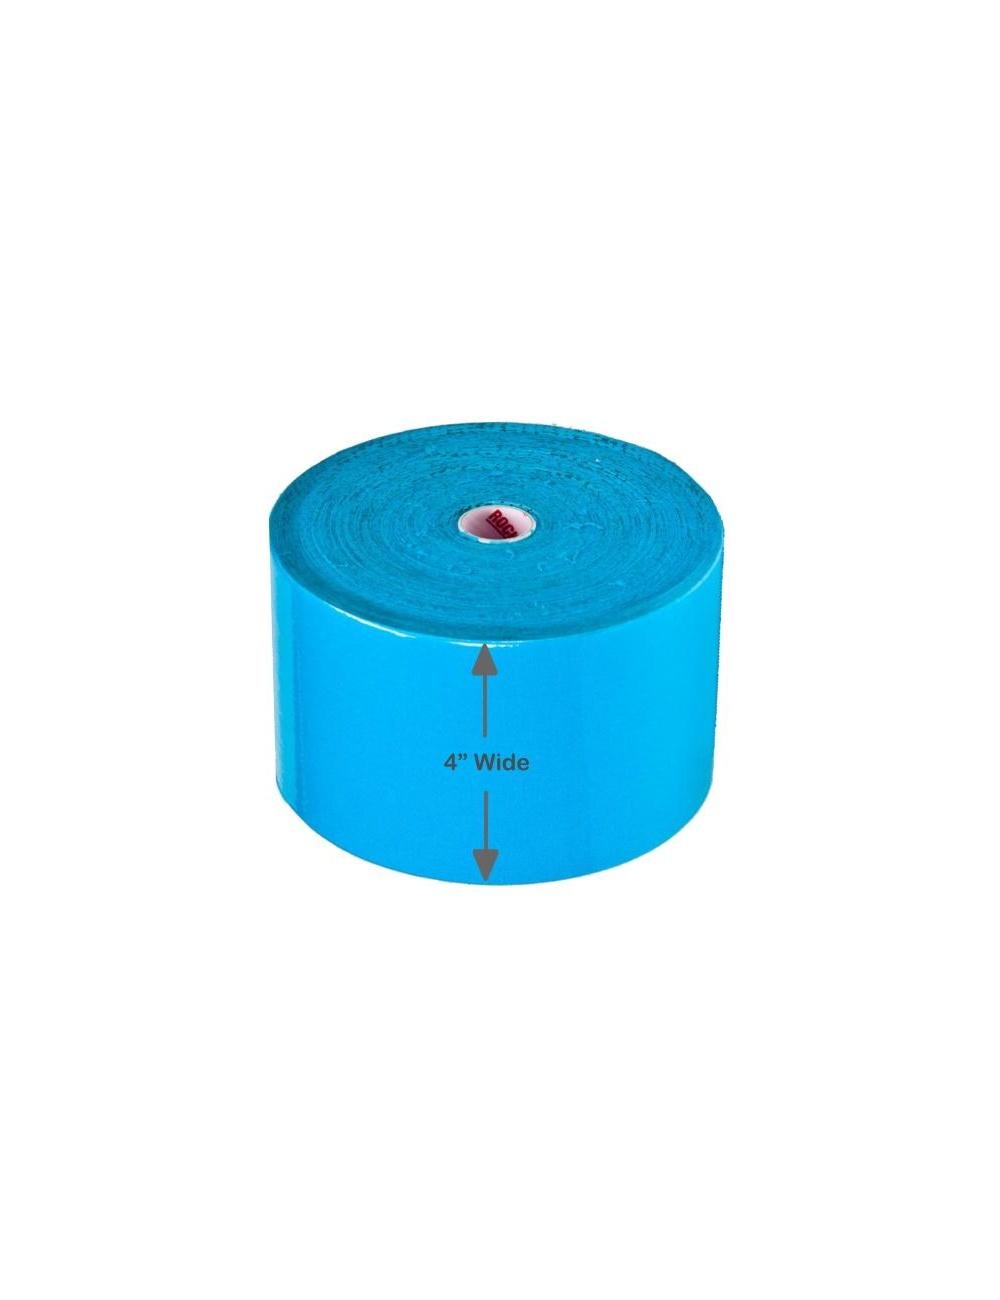 "RockTape Kinesiology Tape 4"" Bulk Roll - Blue"